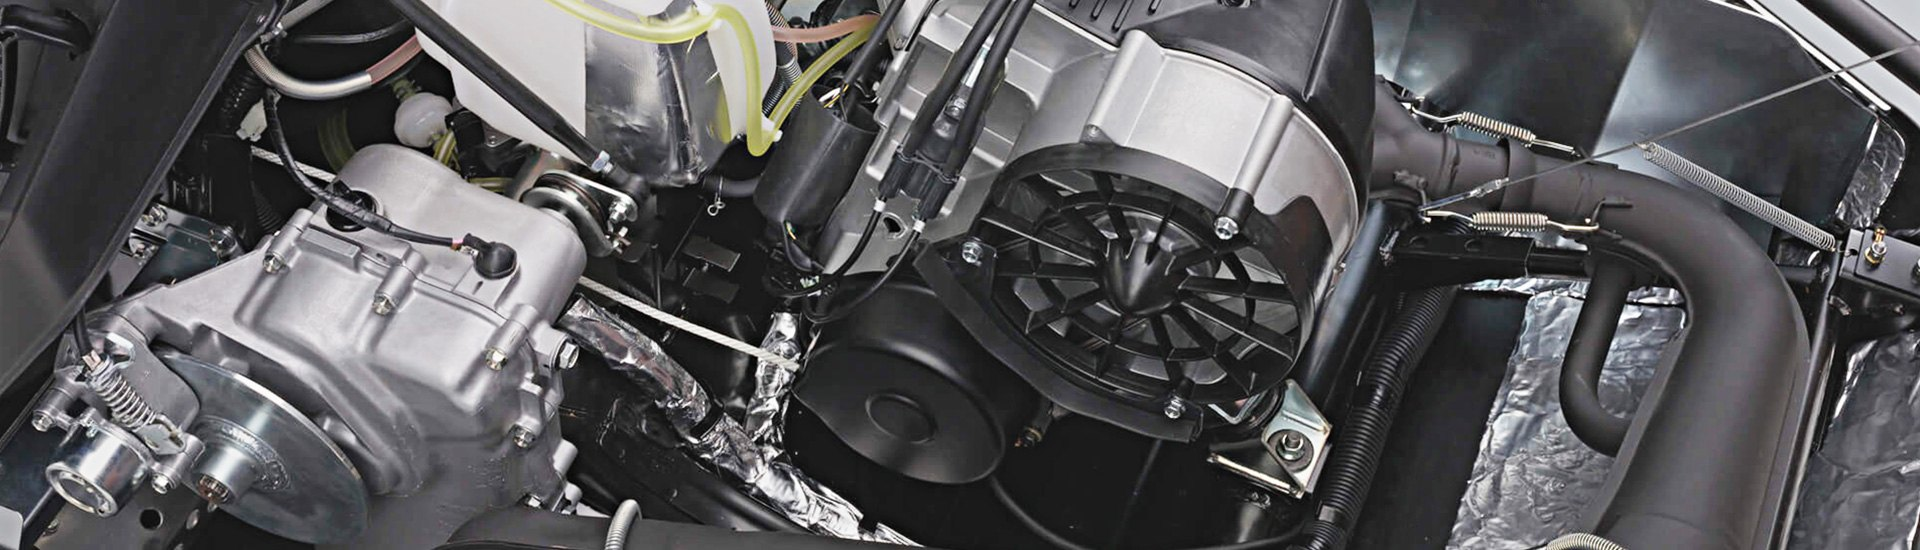 Kawasaki Snowmobile Engine Parts | Belts, Pistons, Rings, Gaskets